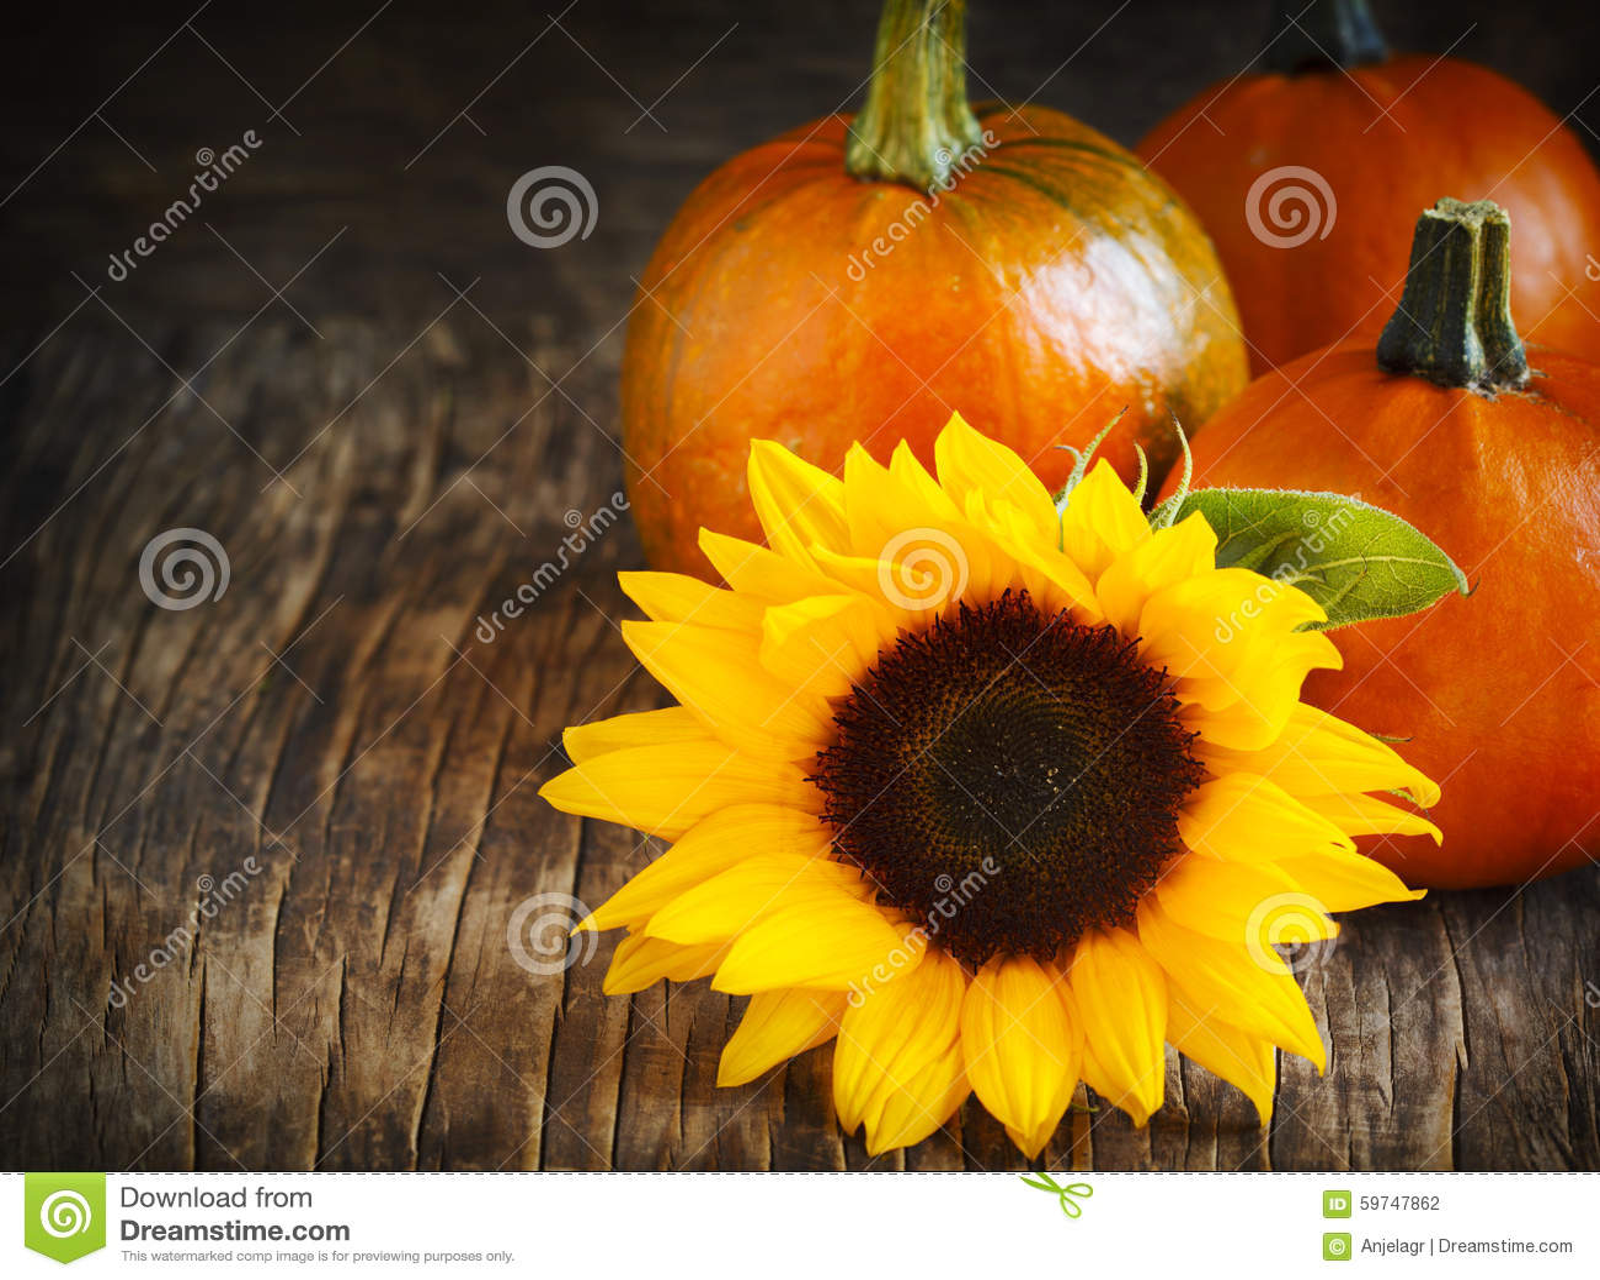 Fall Pumpkin Background Wallpaper Autumn Pumpkins And Sunflower Stock Photo Image Of